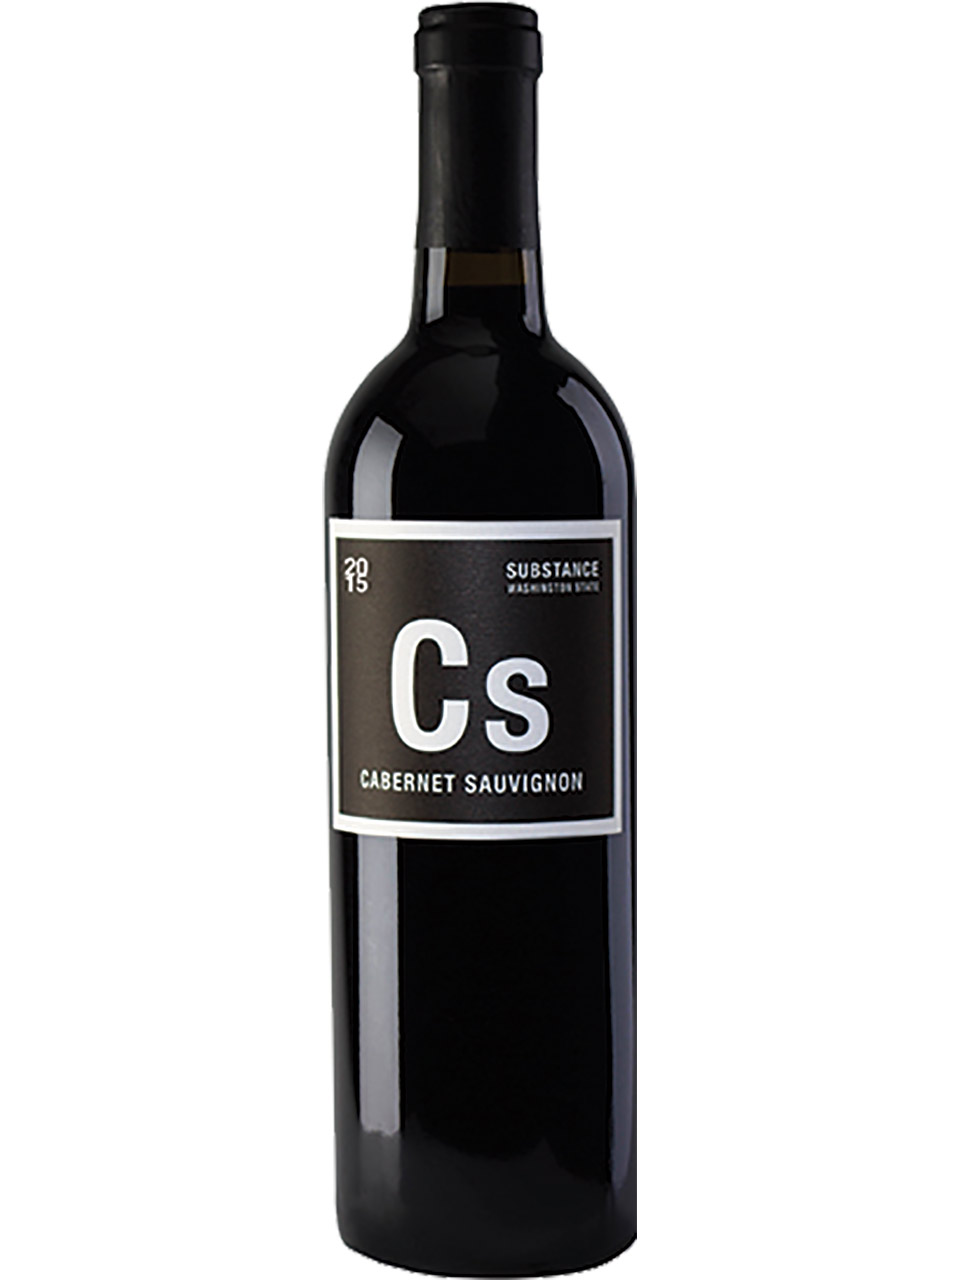 Charles Smith Wine of Substance Cabernet Sauvignon